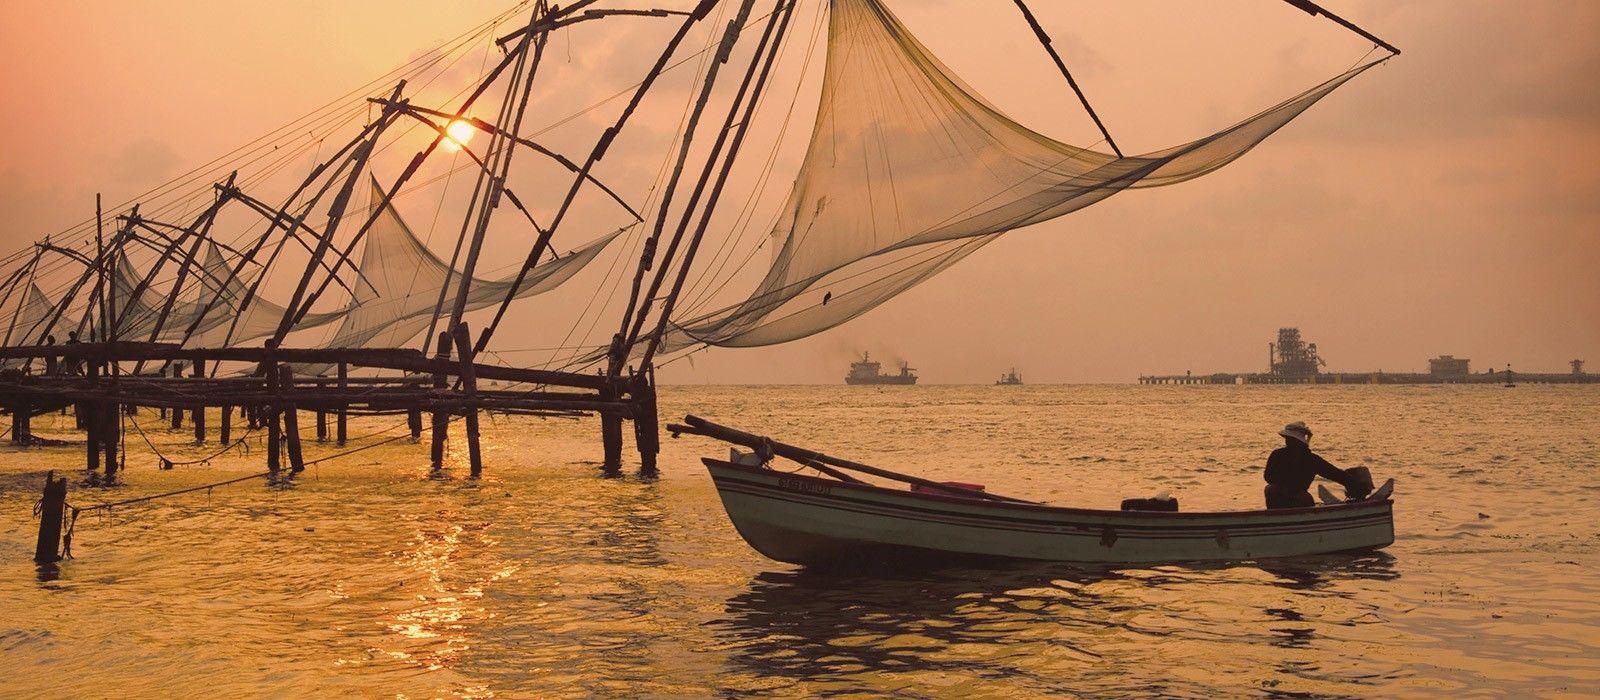 Ayurveda Reise: Erholung pur in Kerala Urlaub 2